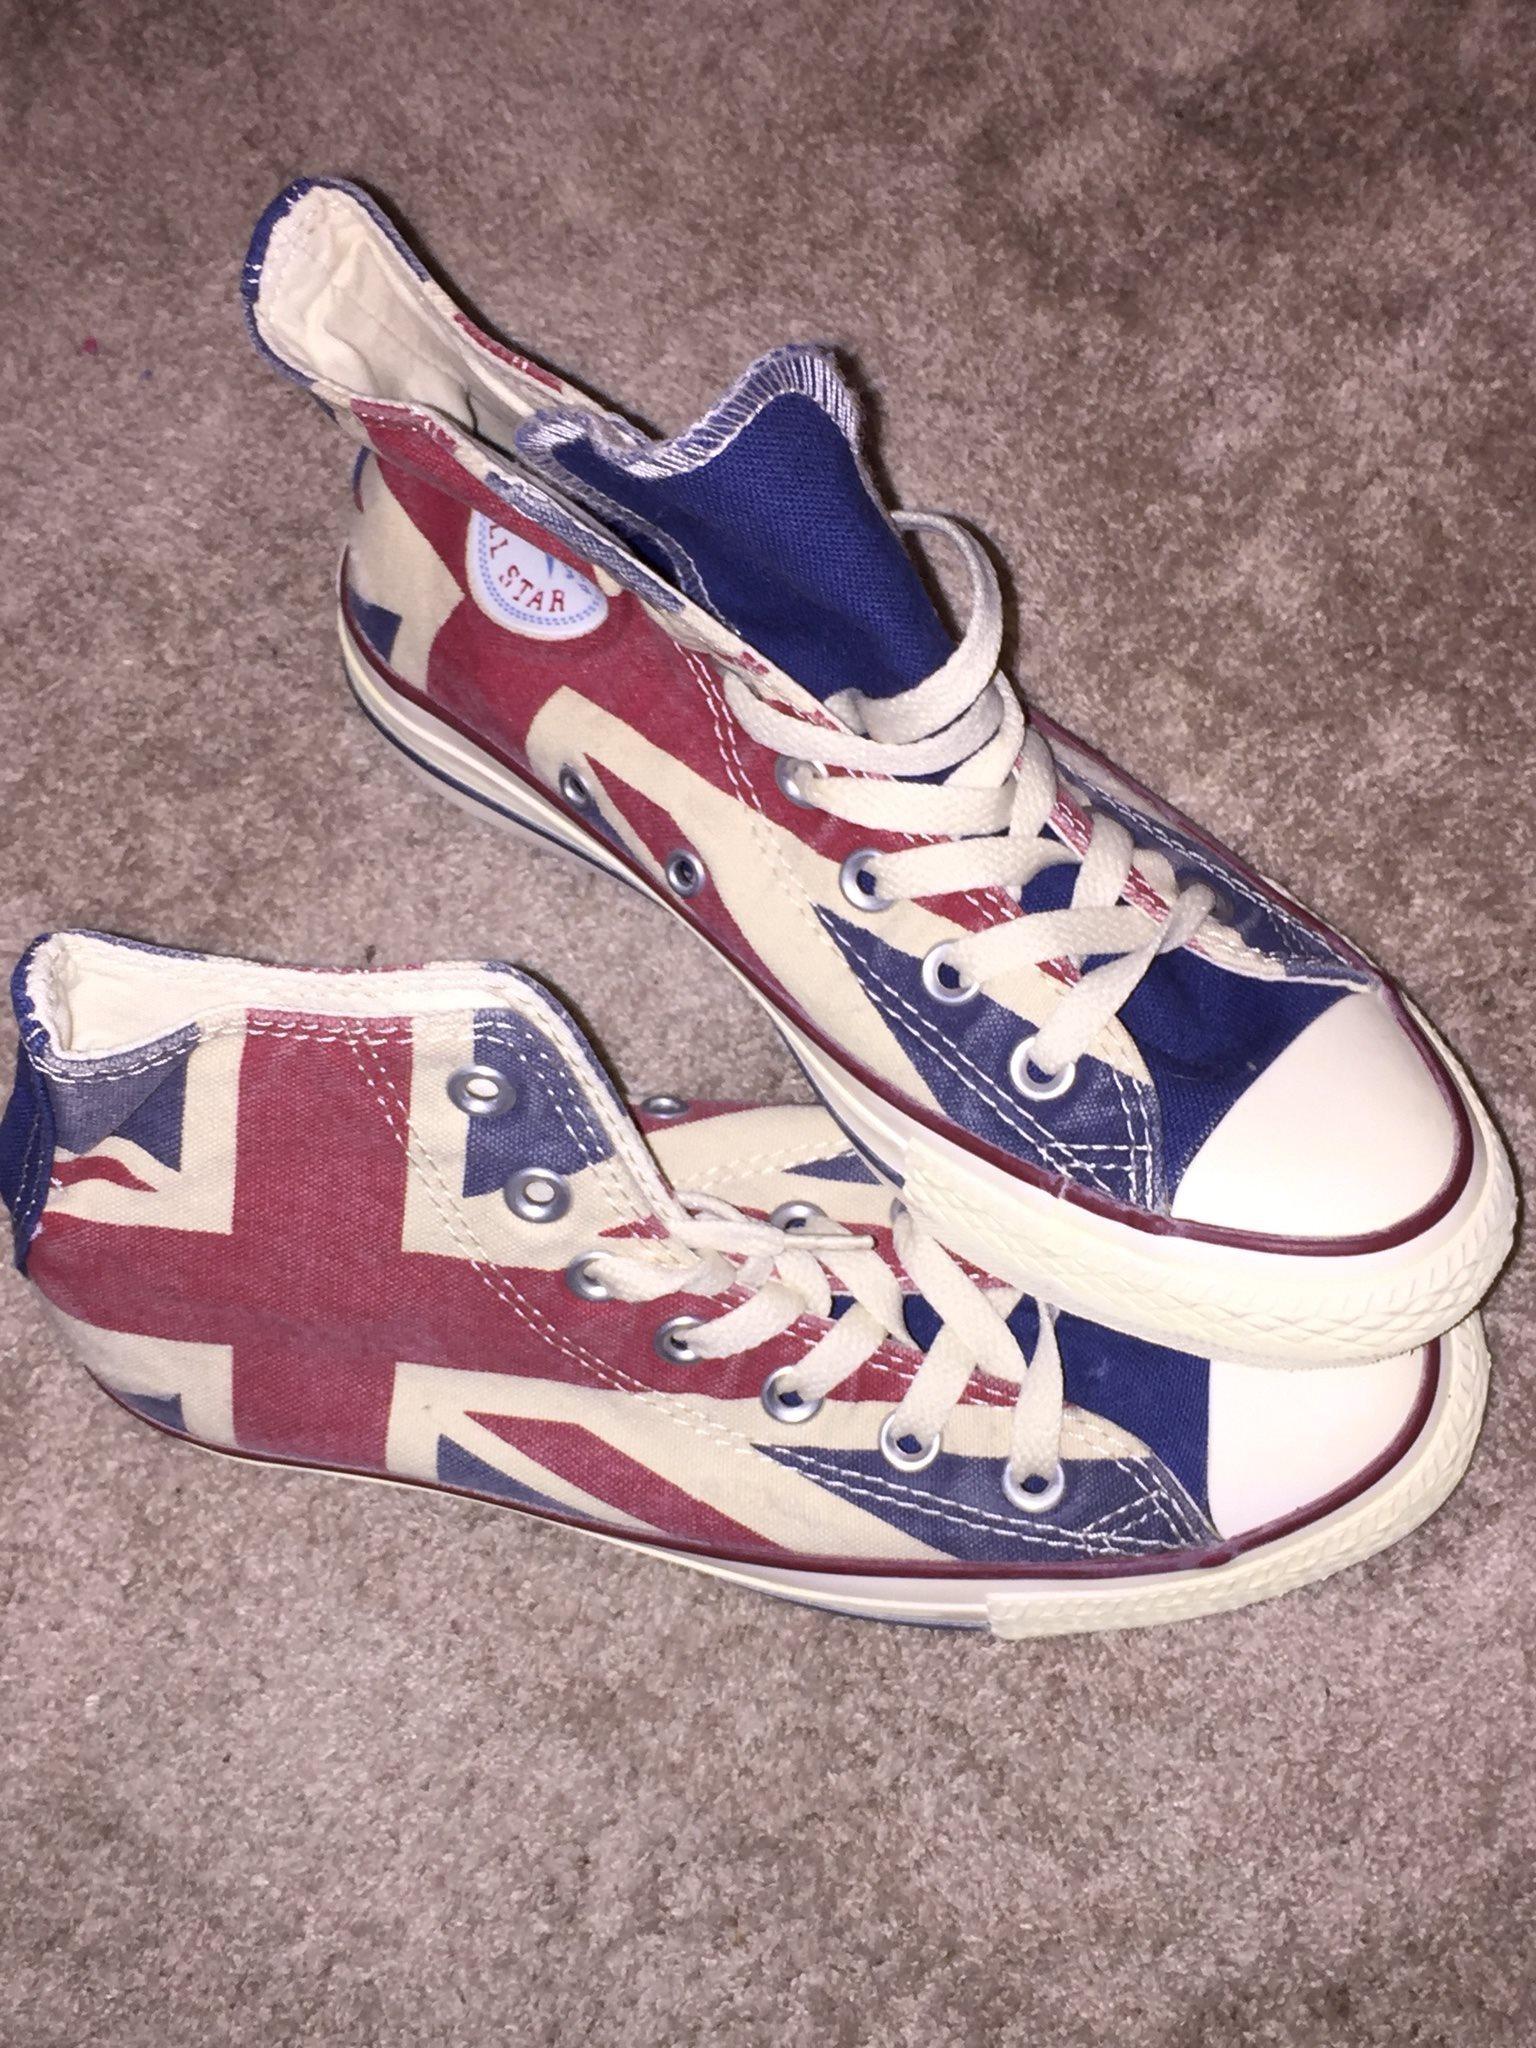 buy online dadf5 1e1da HELT NYA! Converse Chuck Taylor All Star Union Jack, storlek 37